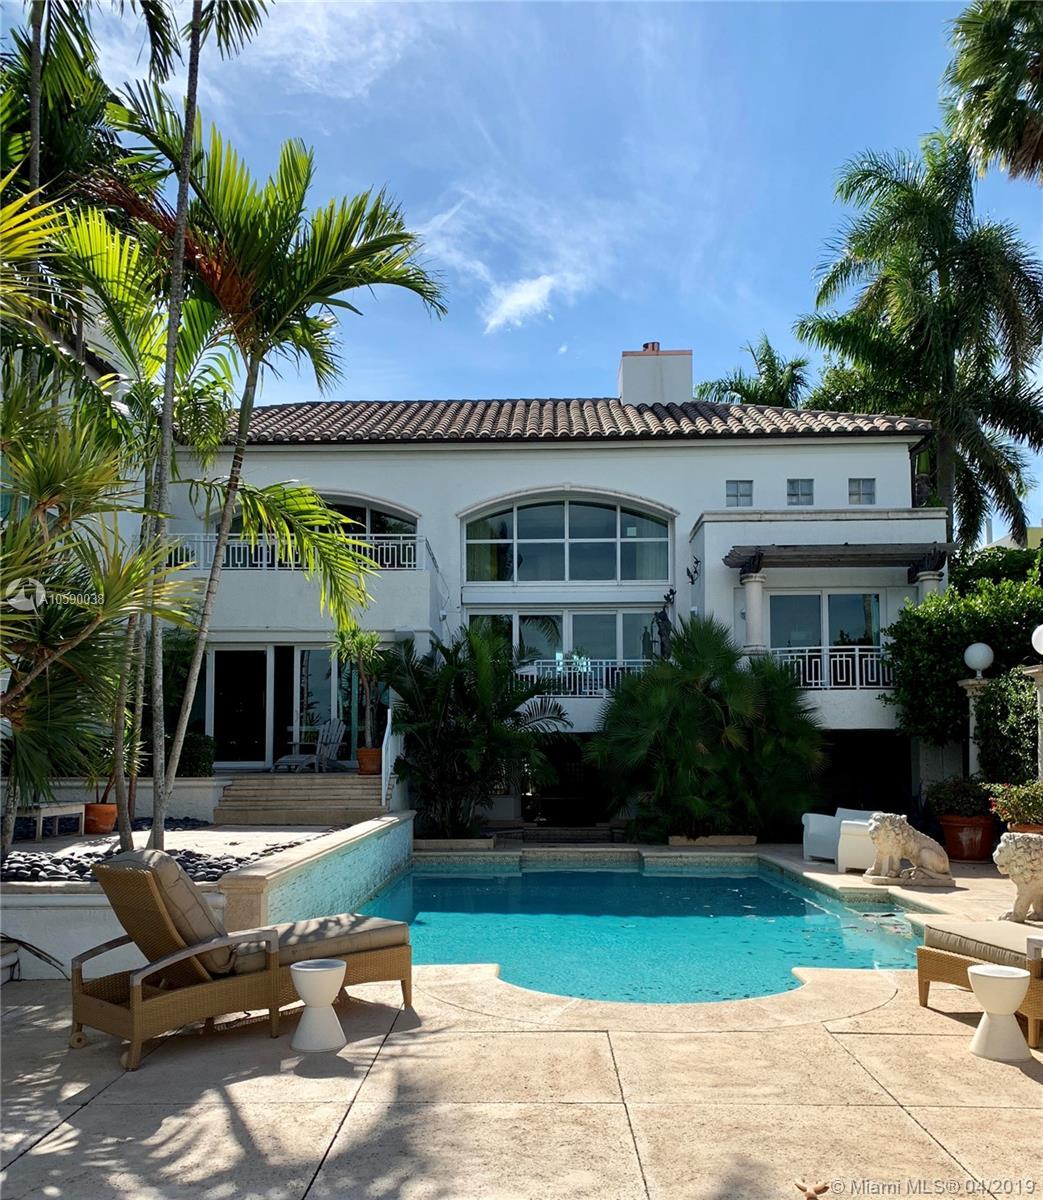 Houses For Sale Miami Beach: Palm Island Real Estate - Royal Realtors